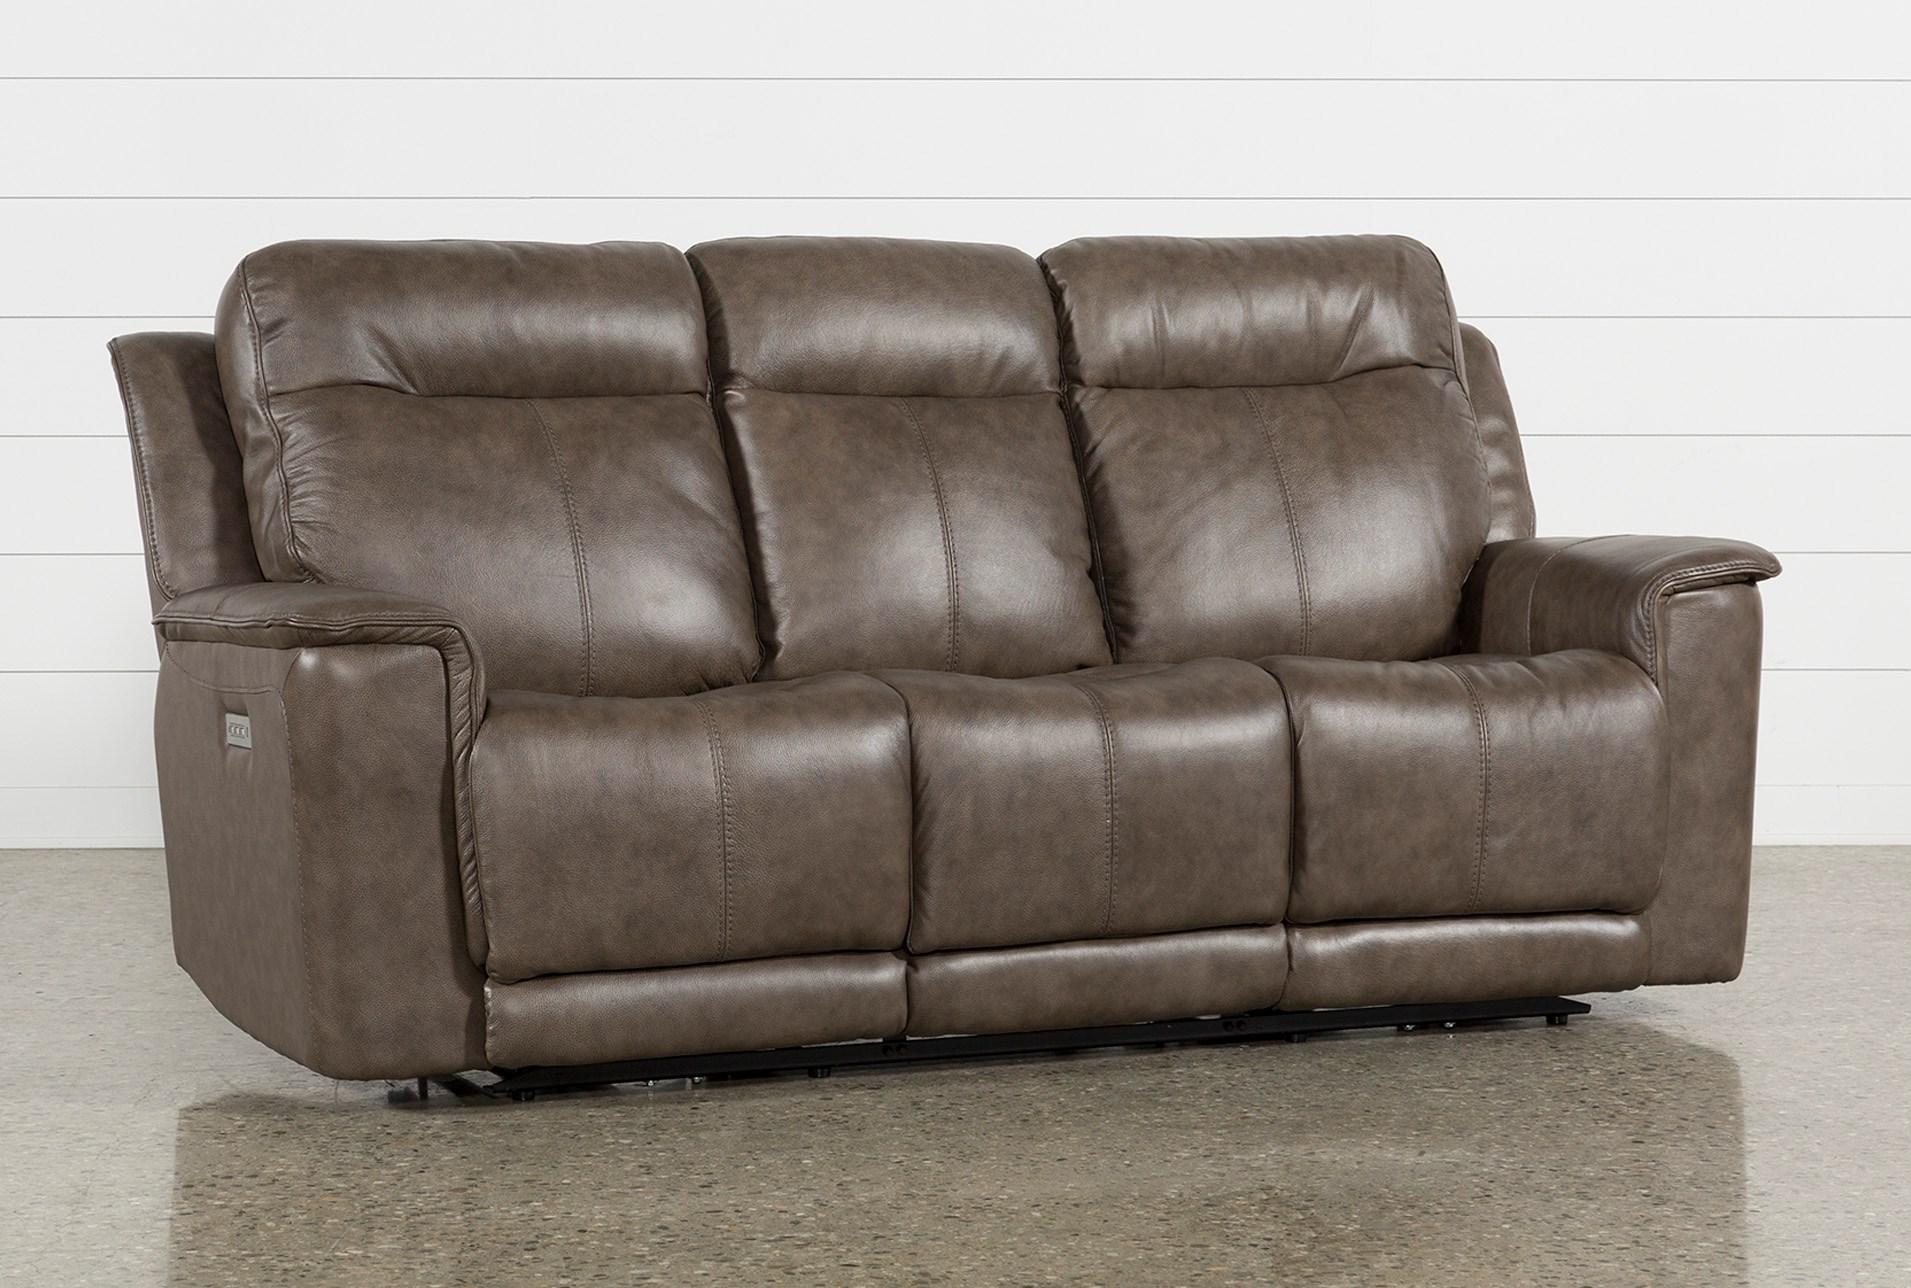 Walsh Mink Power Reclining Sofa W/Power Headrest, Lumbar & Usb